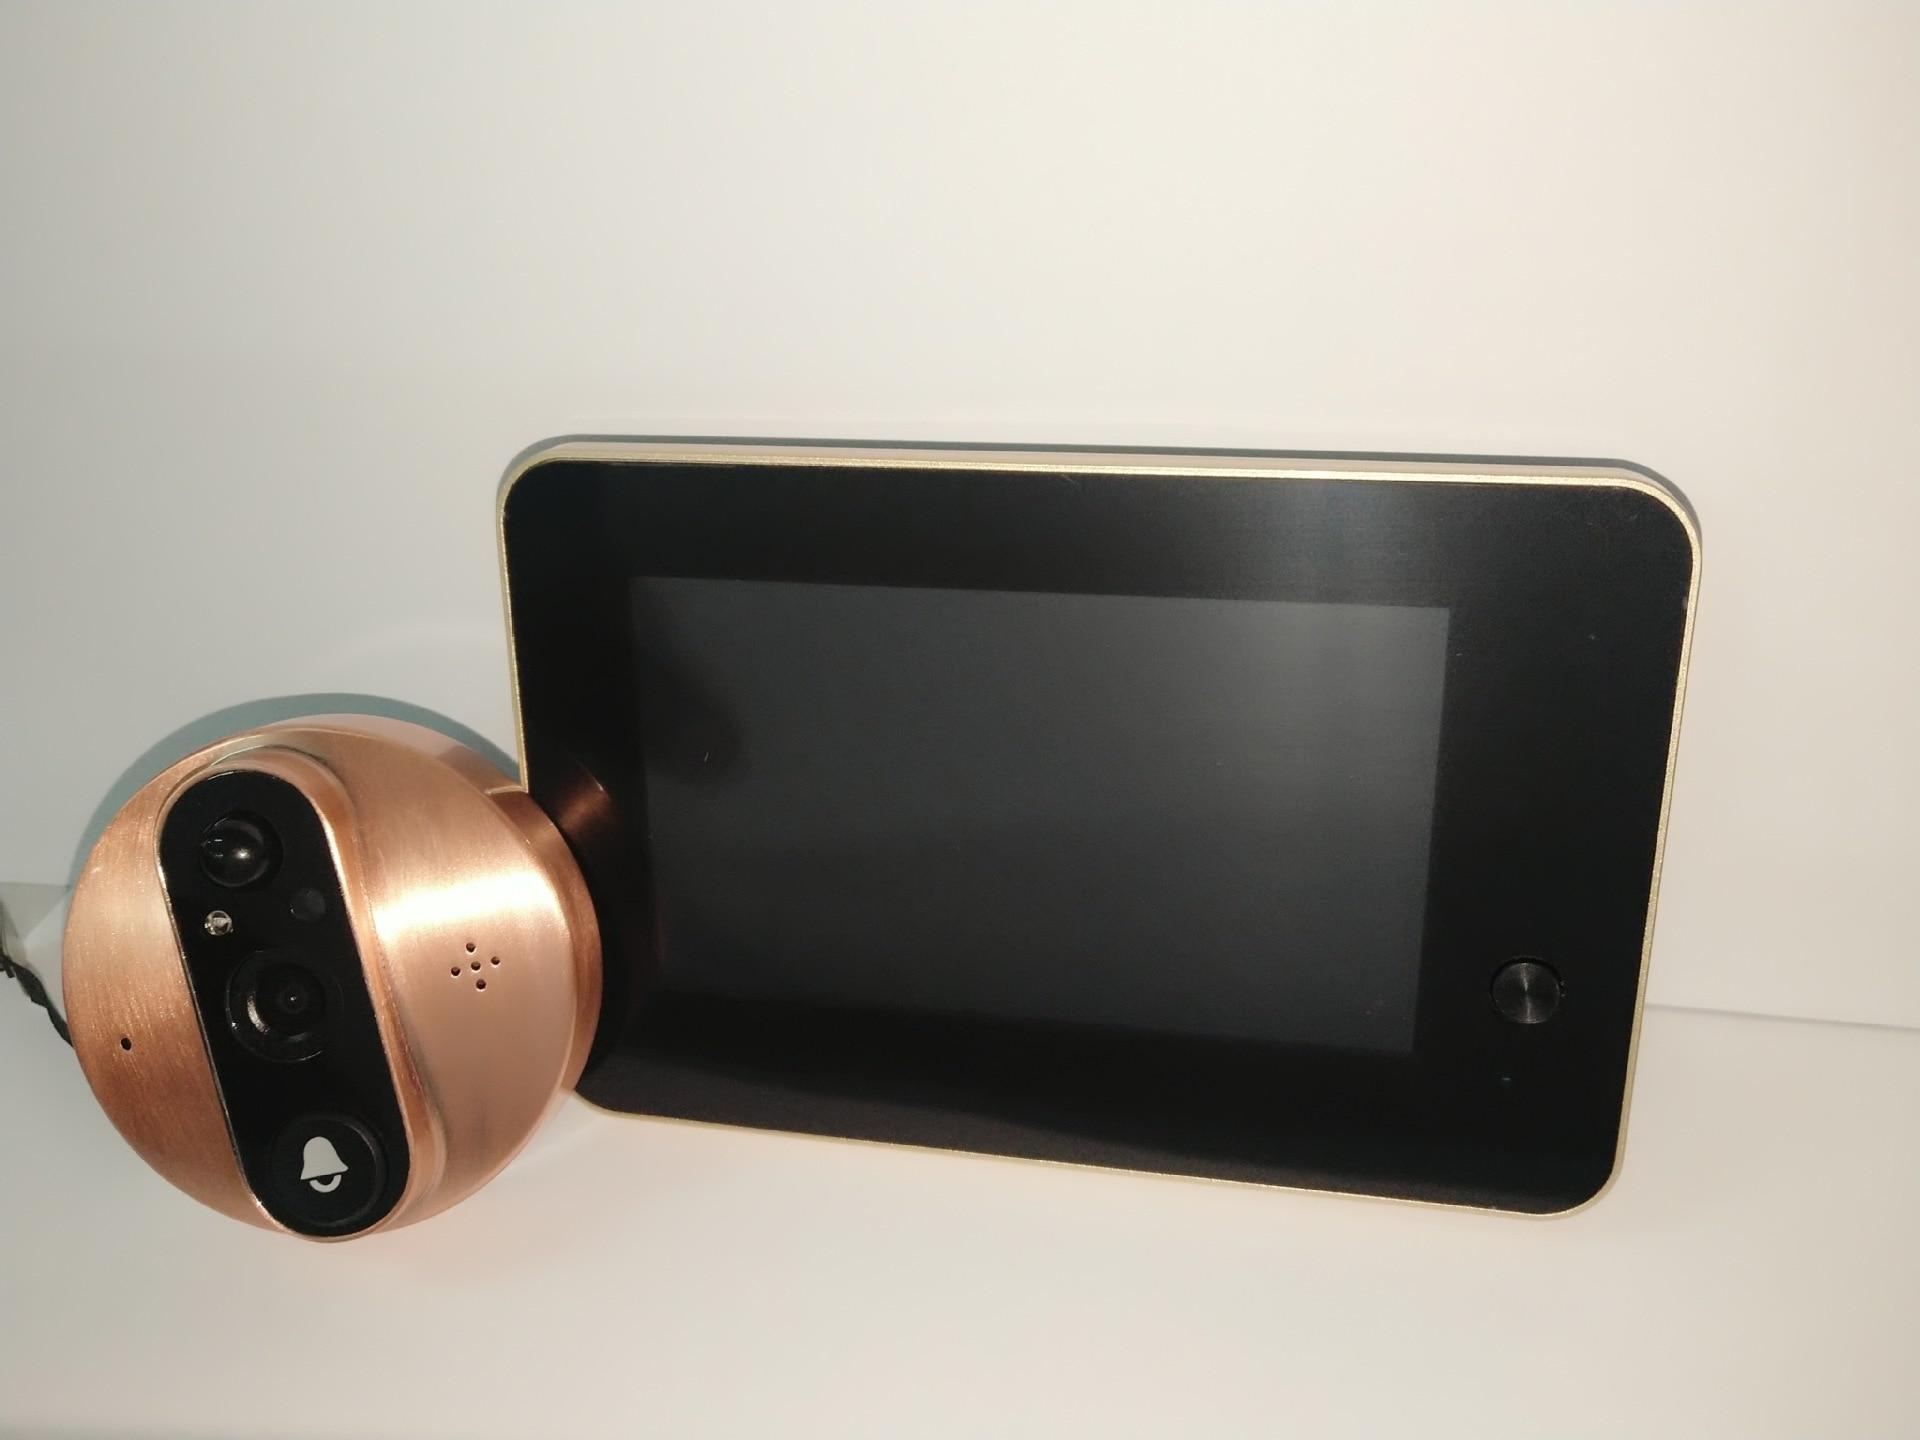 Купить с кэшбэком Wireless Intercom DoorBell Phone App Remote Peephole Infrared Night Security Camera HD Viewer Doorbell Apartment Door Security